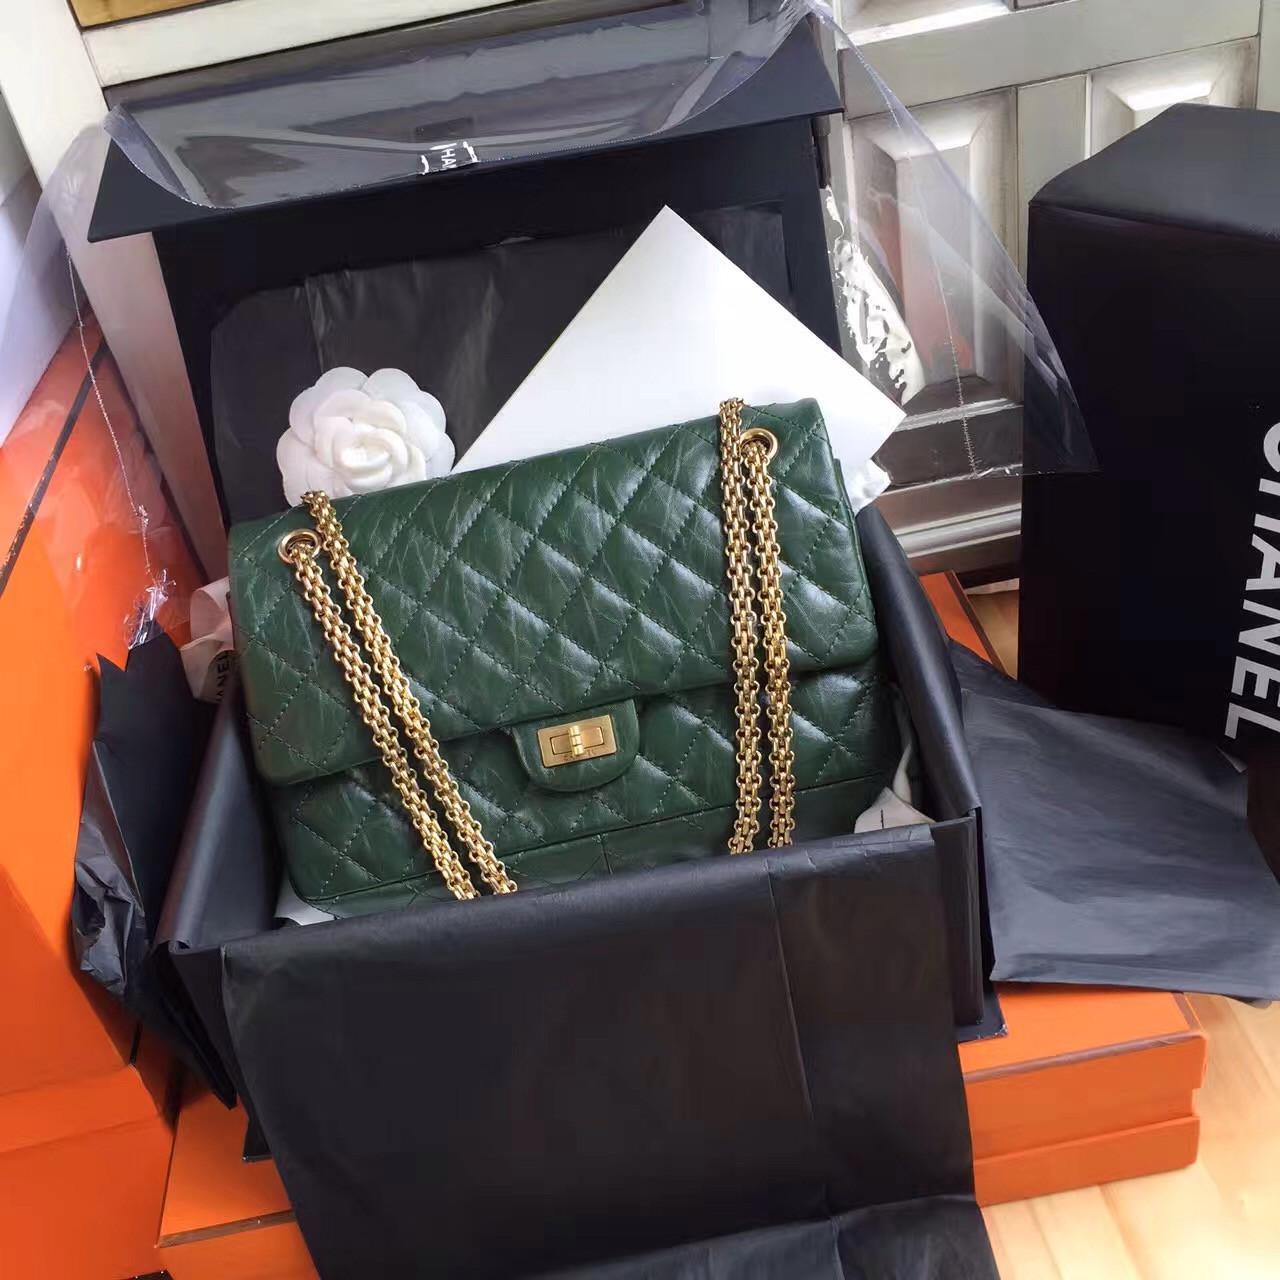 Chanel Large Green Reissue 2.55 Handbag A37587 - Bella Vita Moda 346773a0d6856